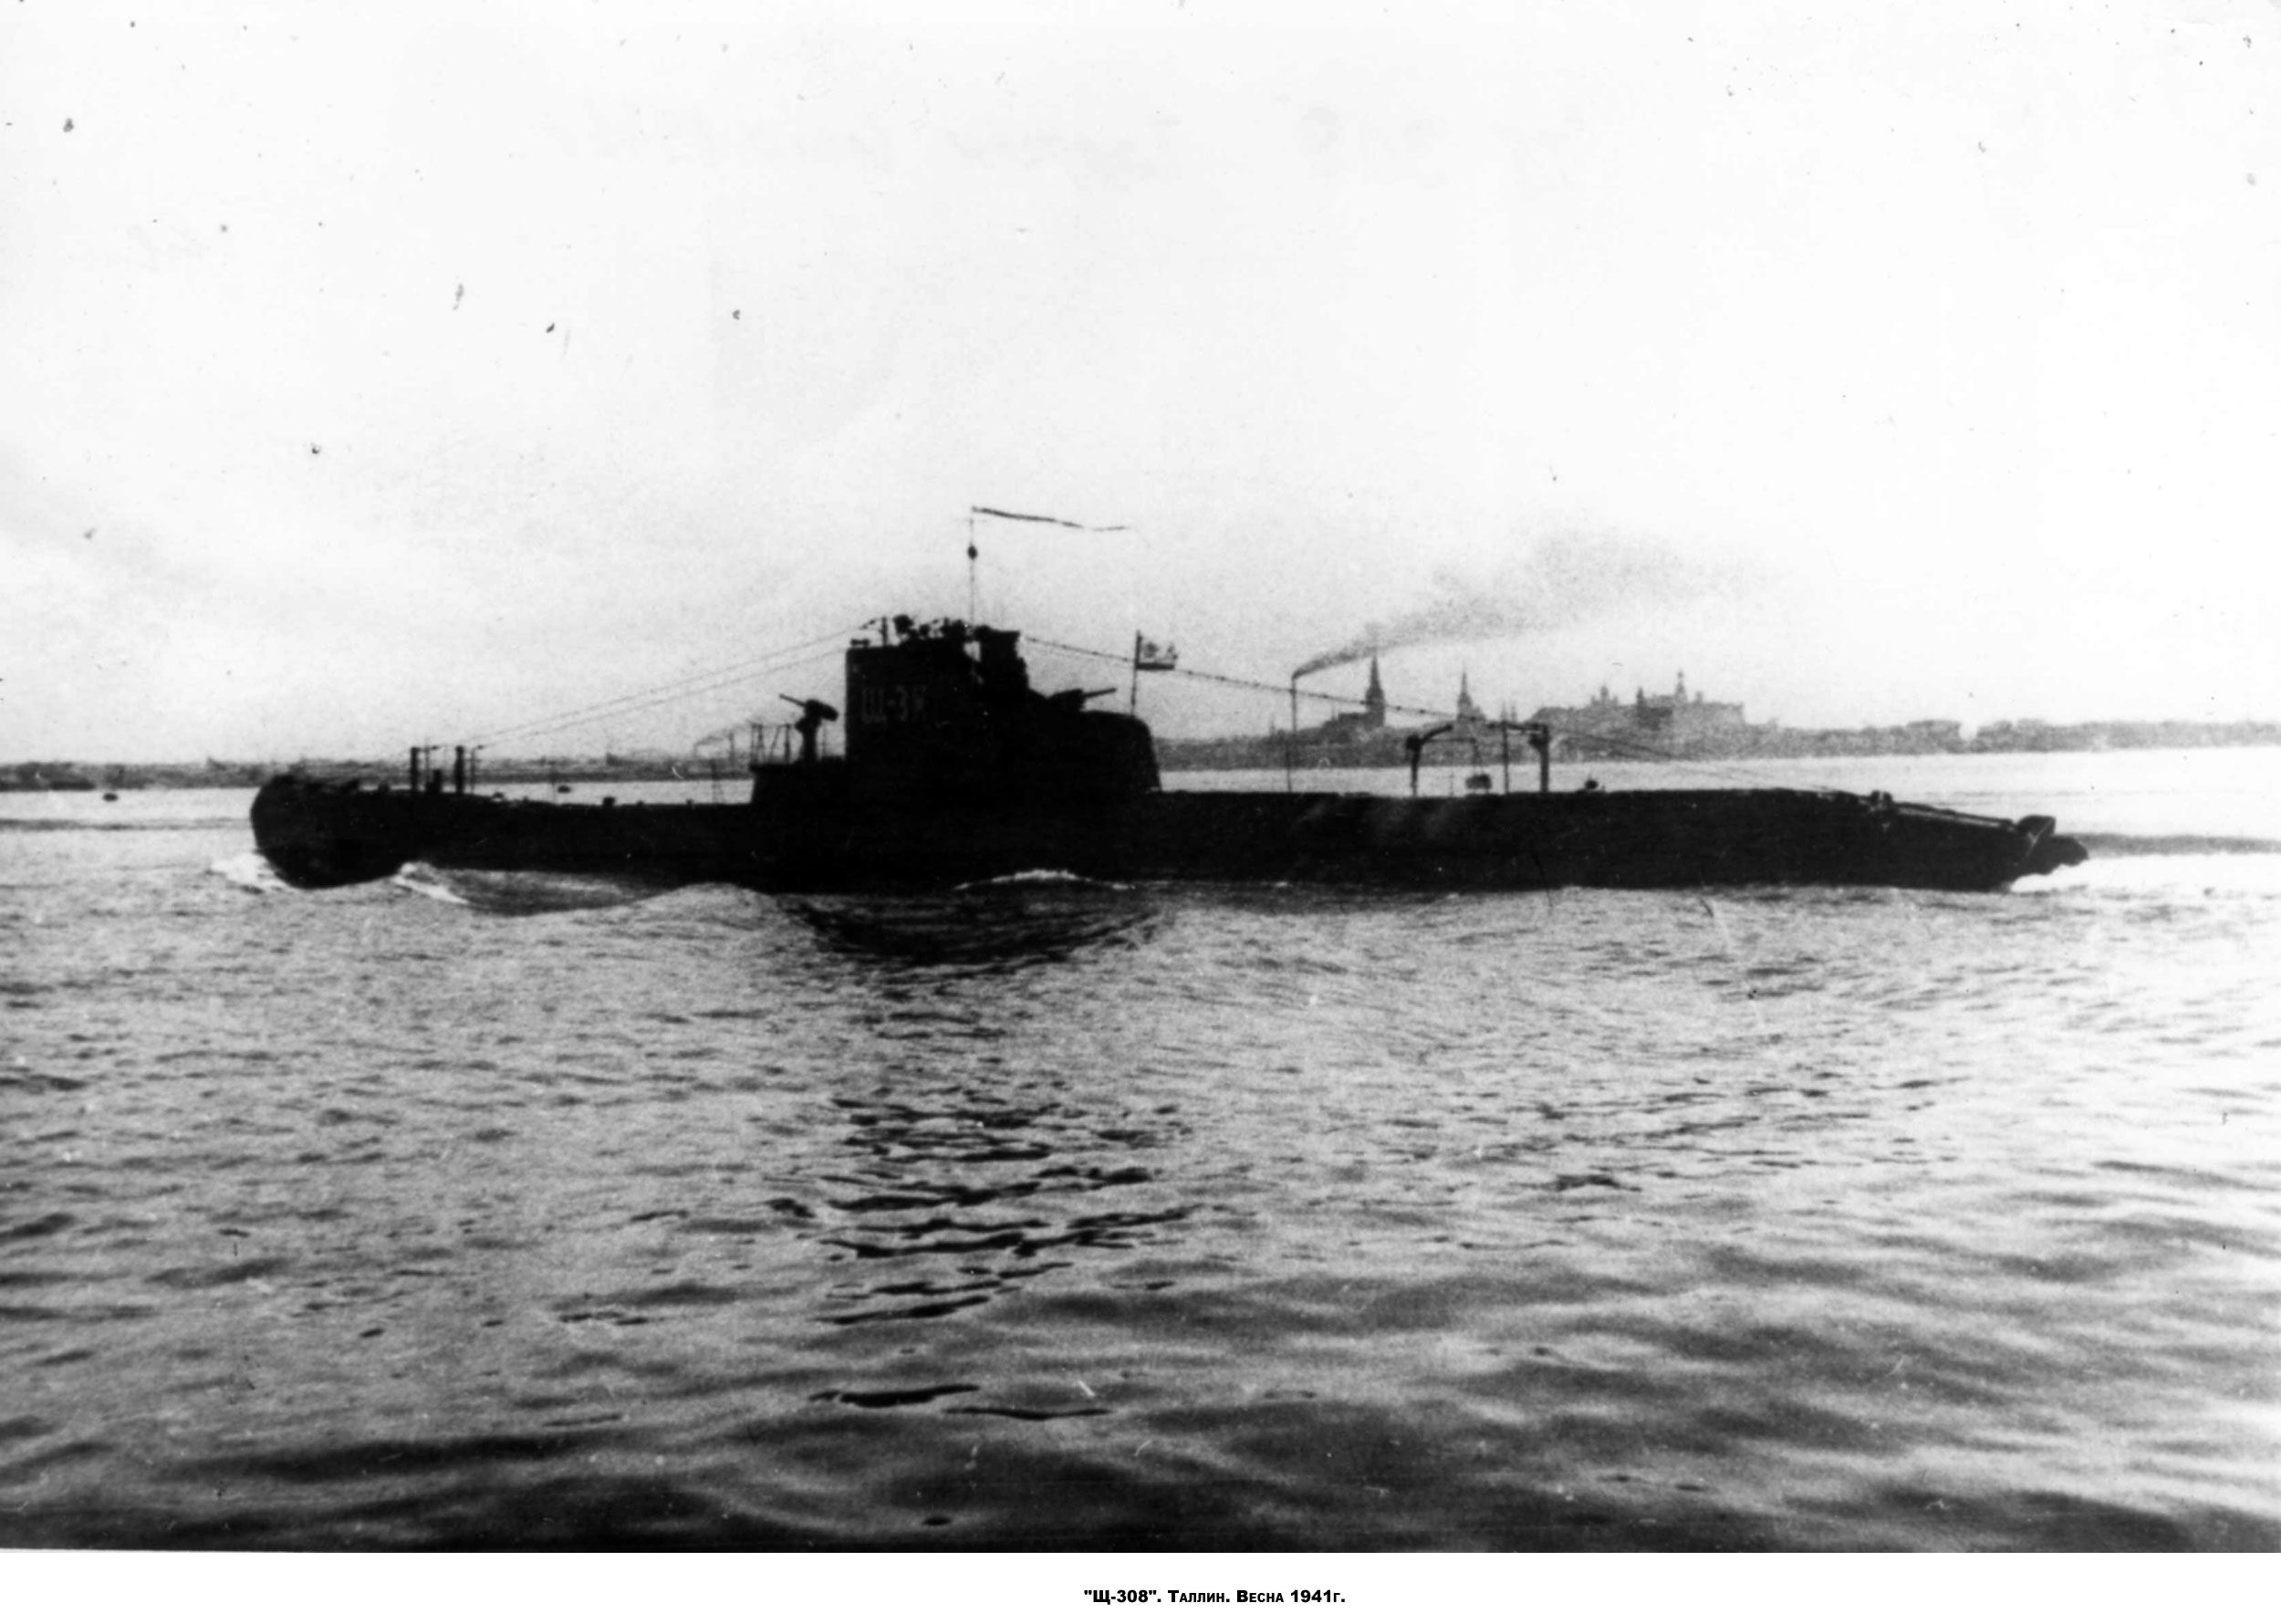 http://www.navy.su/navysub191745/sha-5bis/images/sha-308_00.jpg